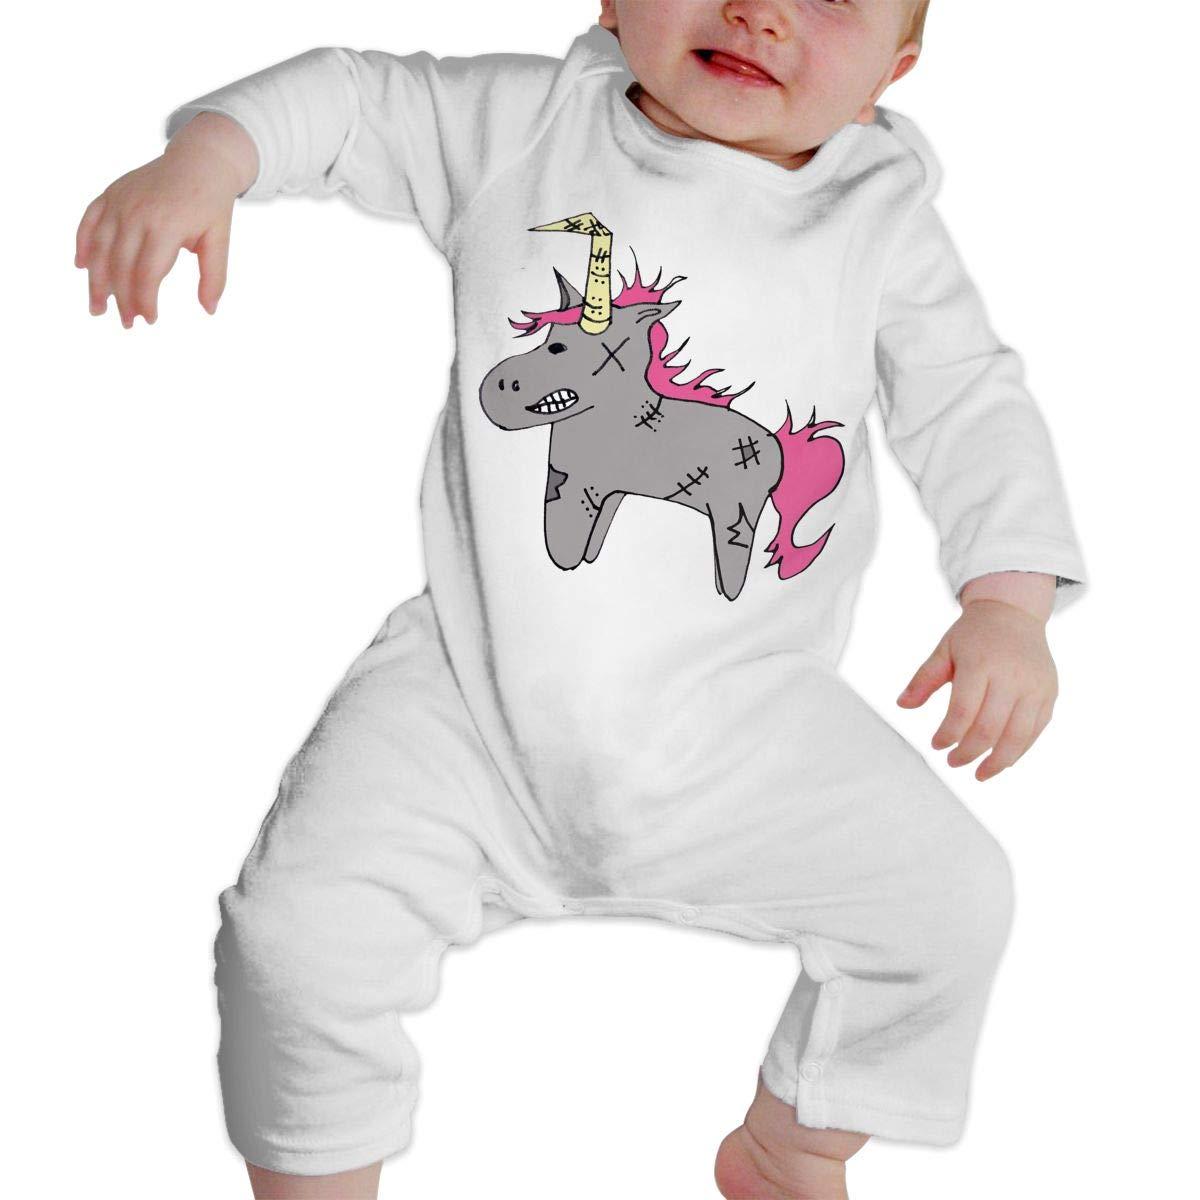 KAYERDELLE Poor Unicorn Long-Sleeve Unisex Baby Onesies for 6-24 Months Infant